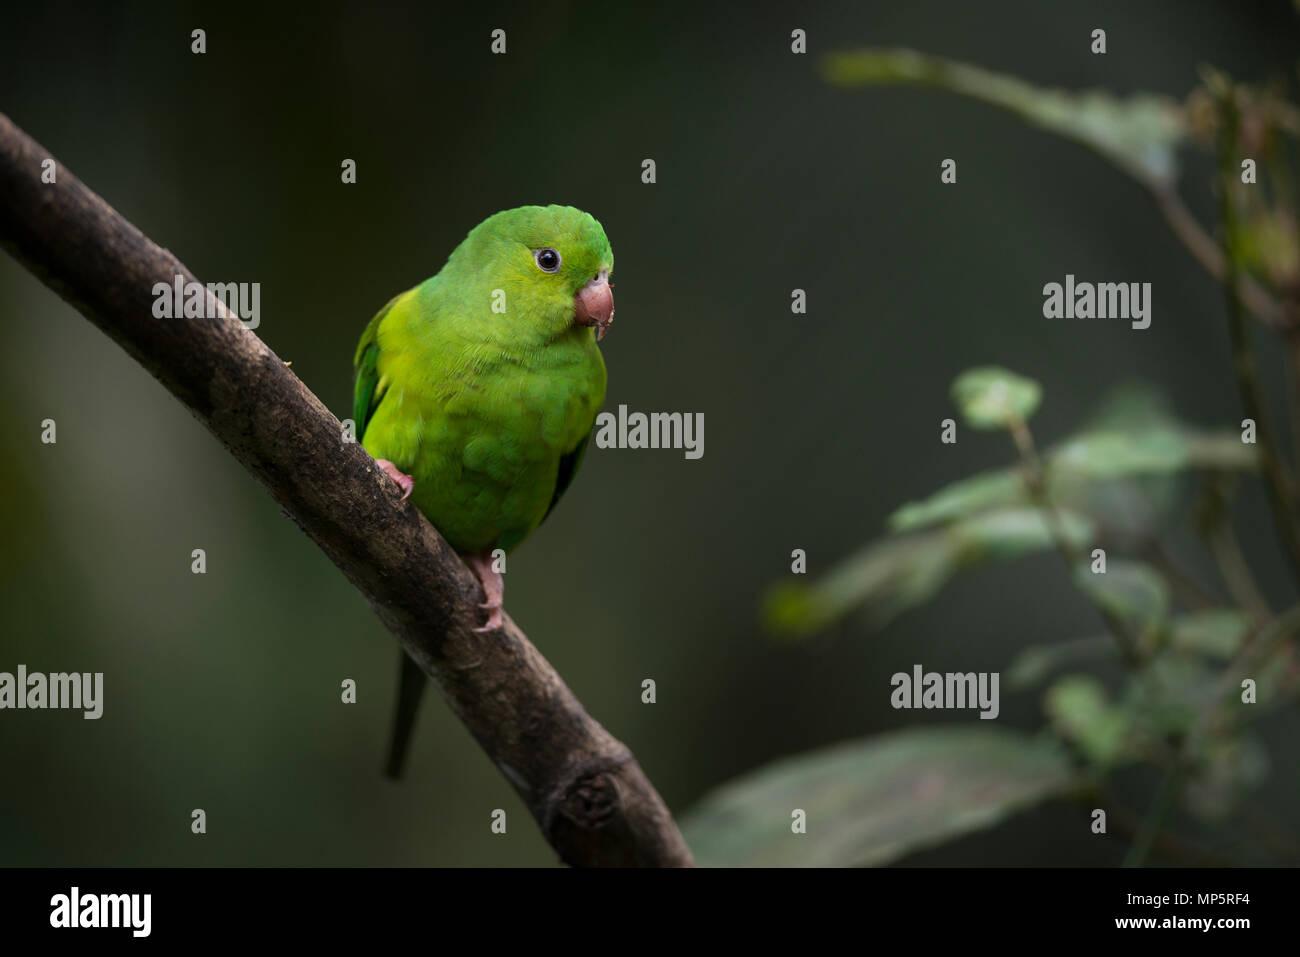 A Plain Parakeet (Brotogeris tirica) from the Atlantic Rainforest of SE Brazil - Stock Image